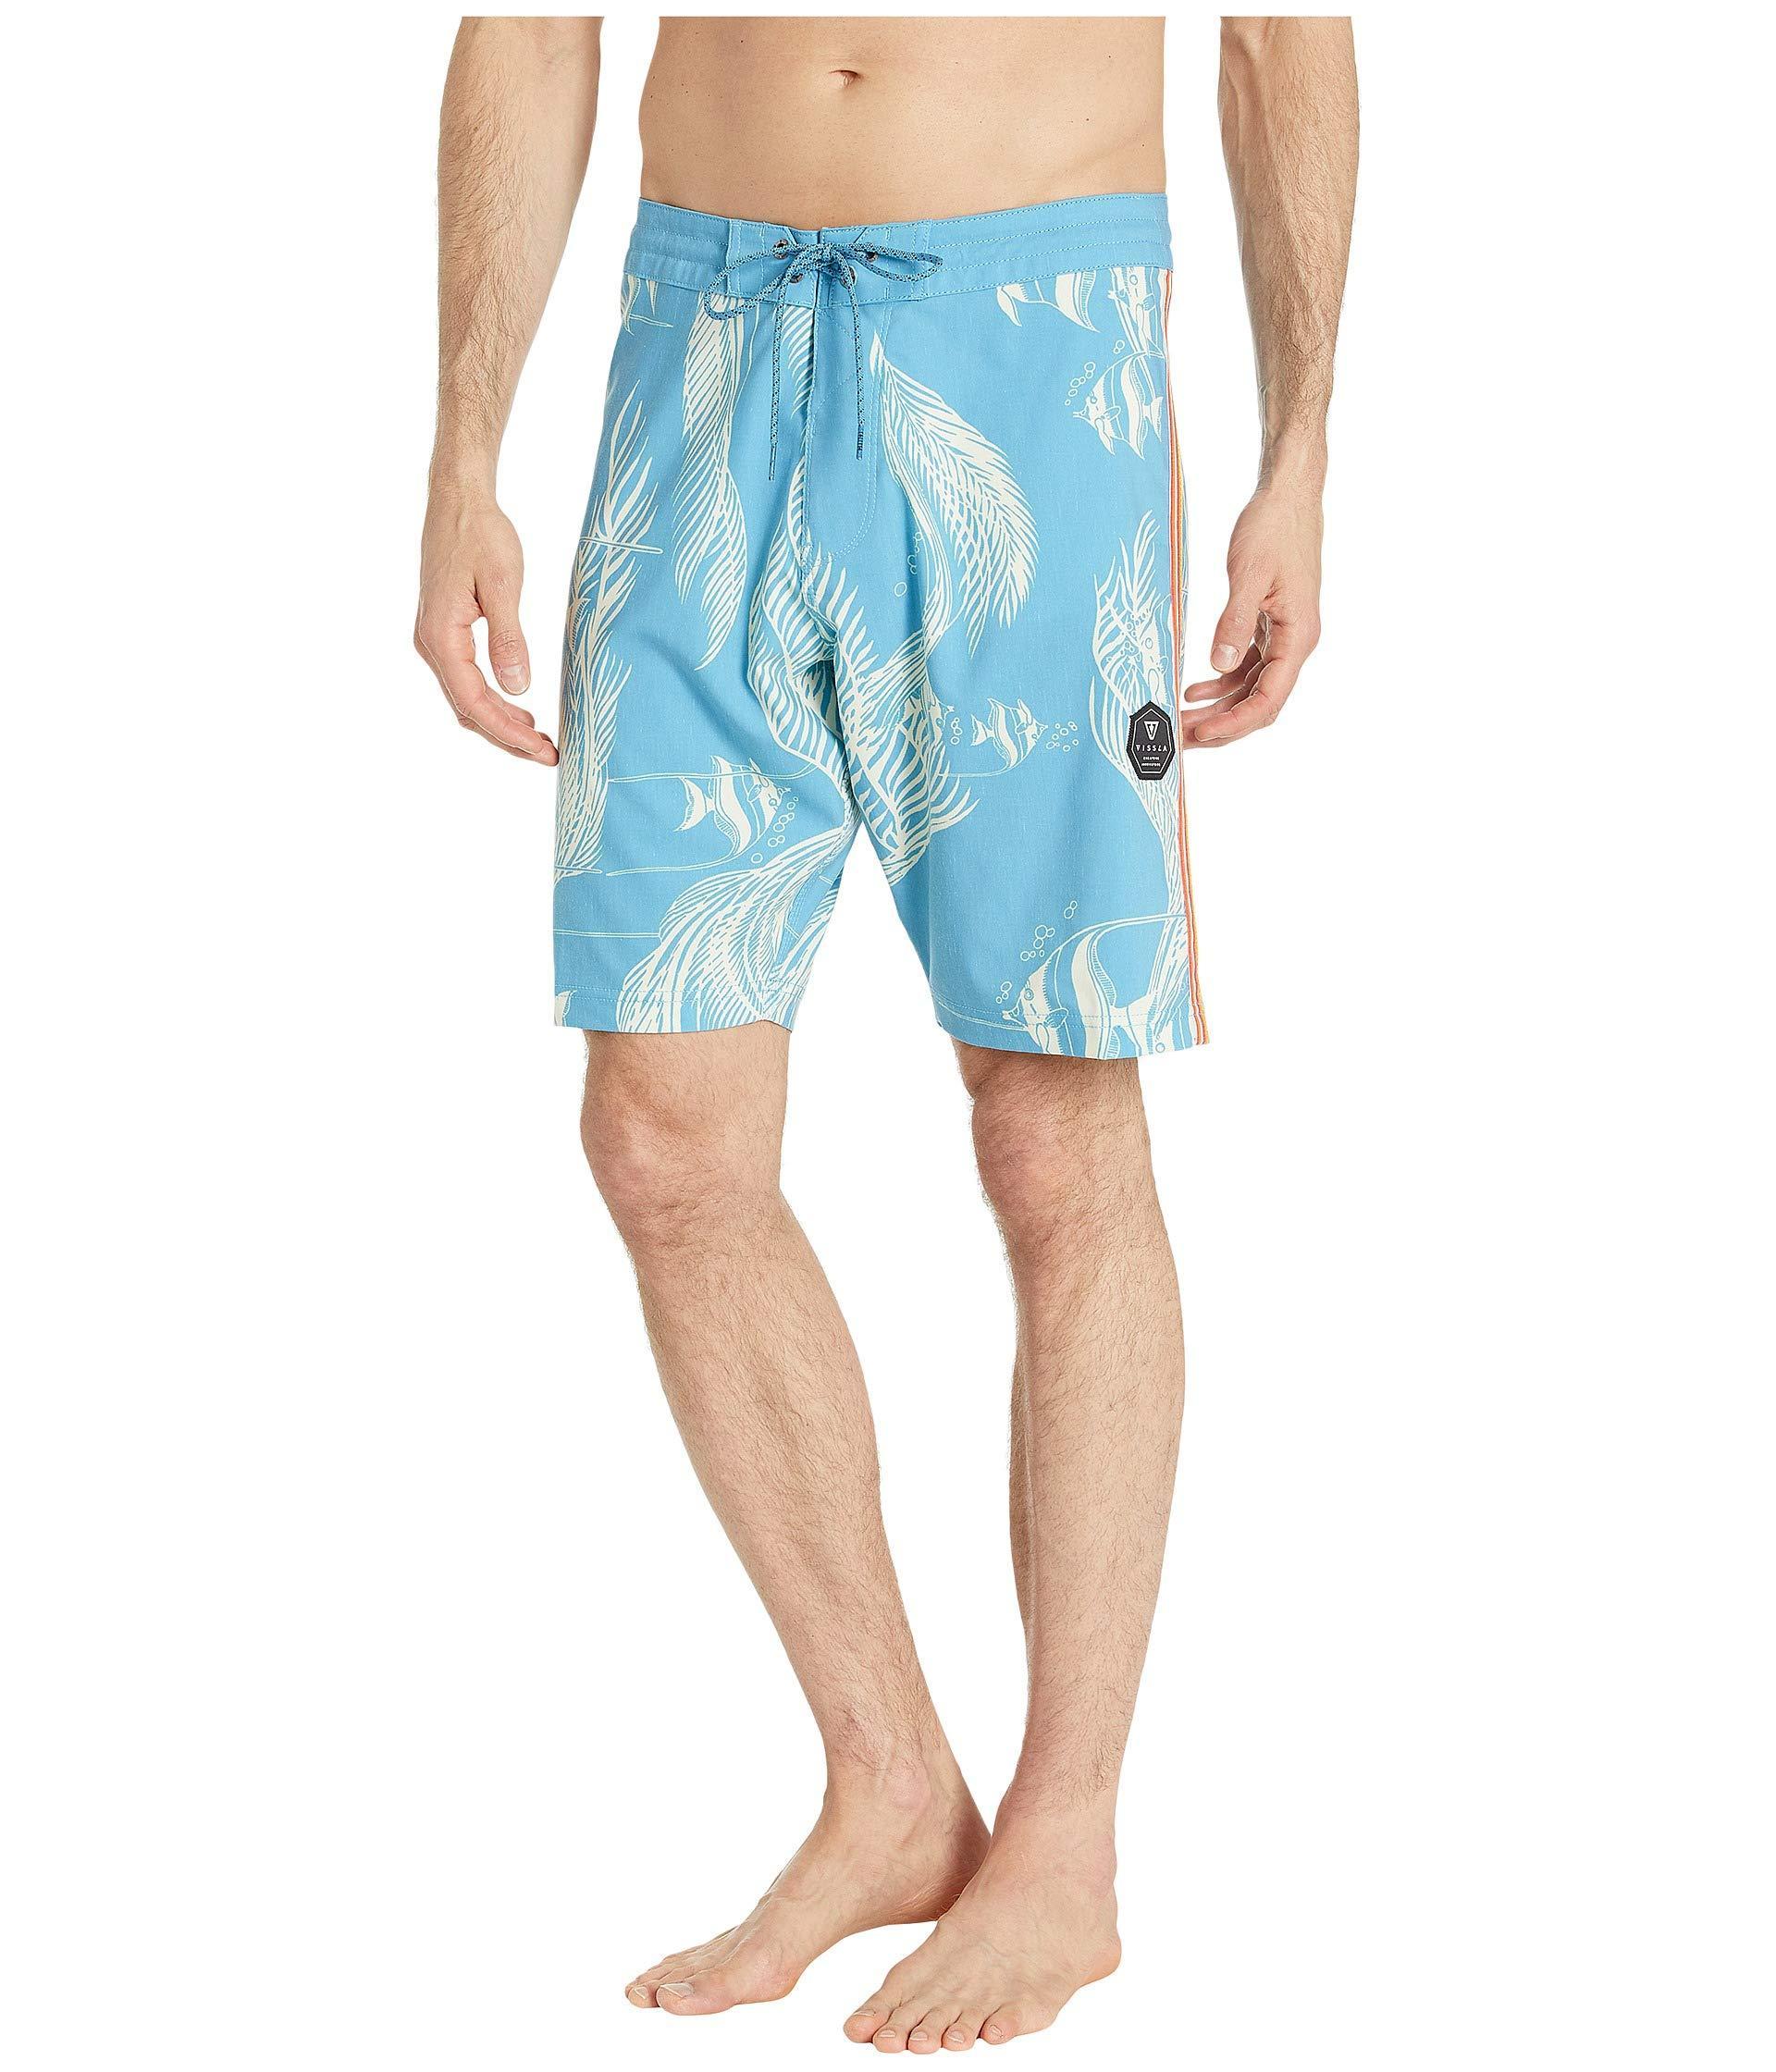 60e0c85006 Vissla 20 Kihi Kihi Boardshorts (blue Wash) Men's Swimwear in Blue ...